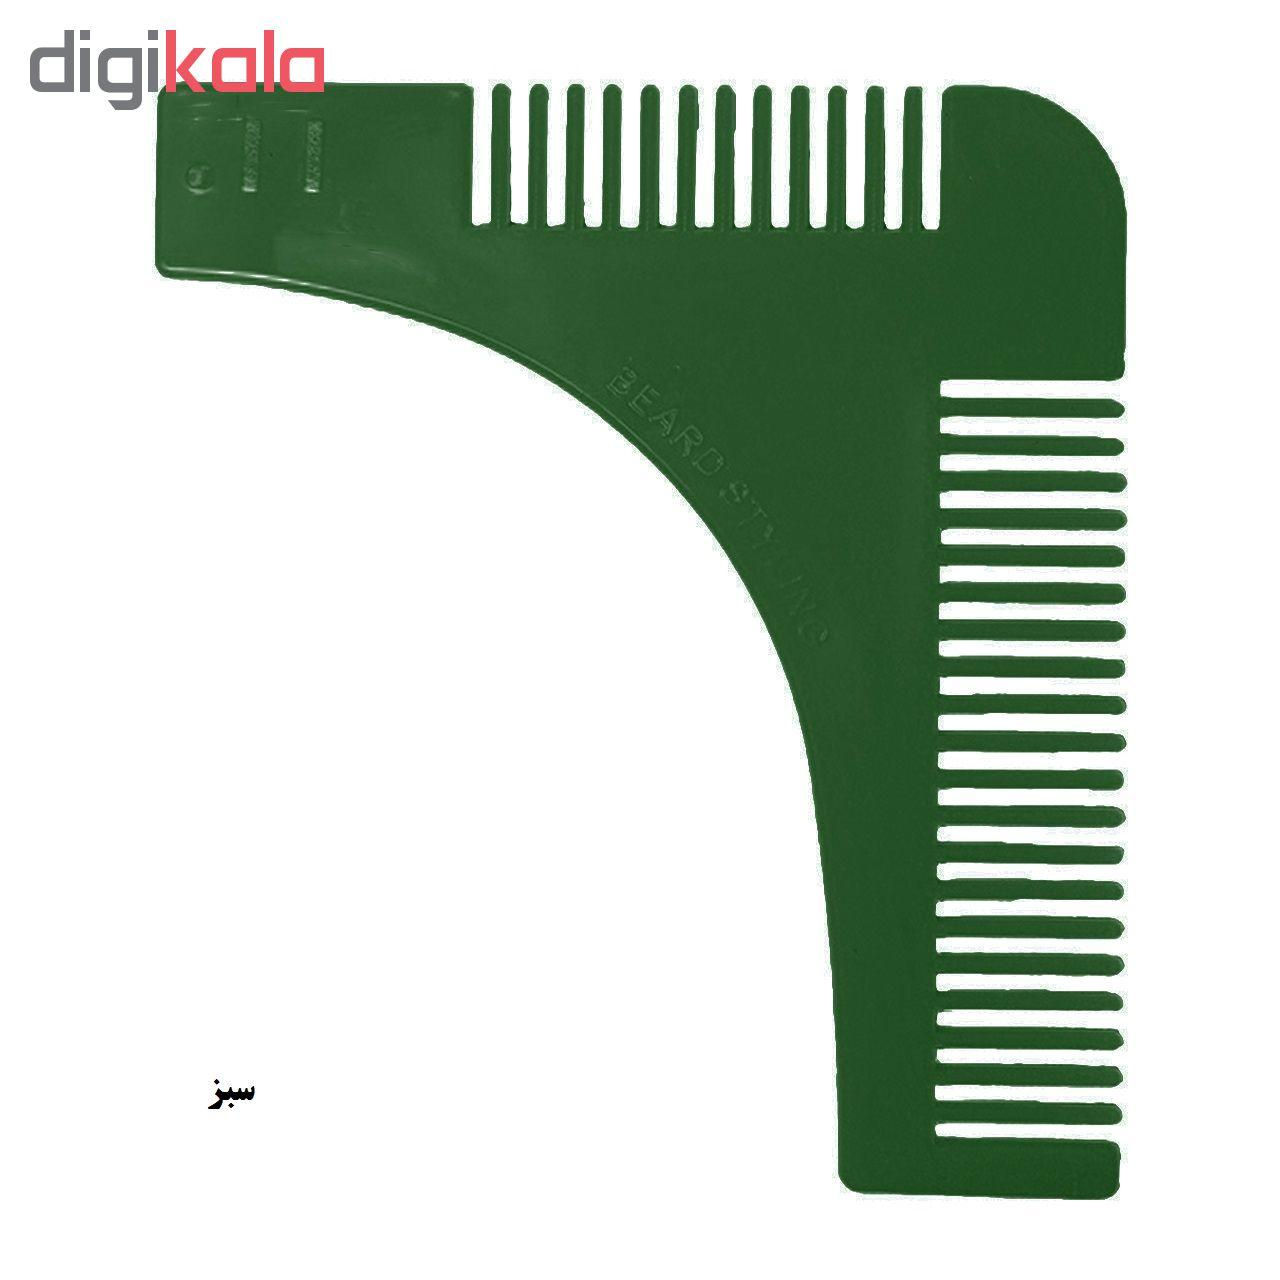 شانه اصلاح ریش مدل Beard Styling main 1 3